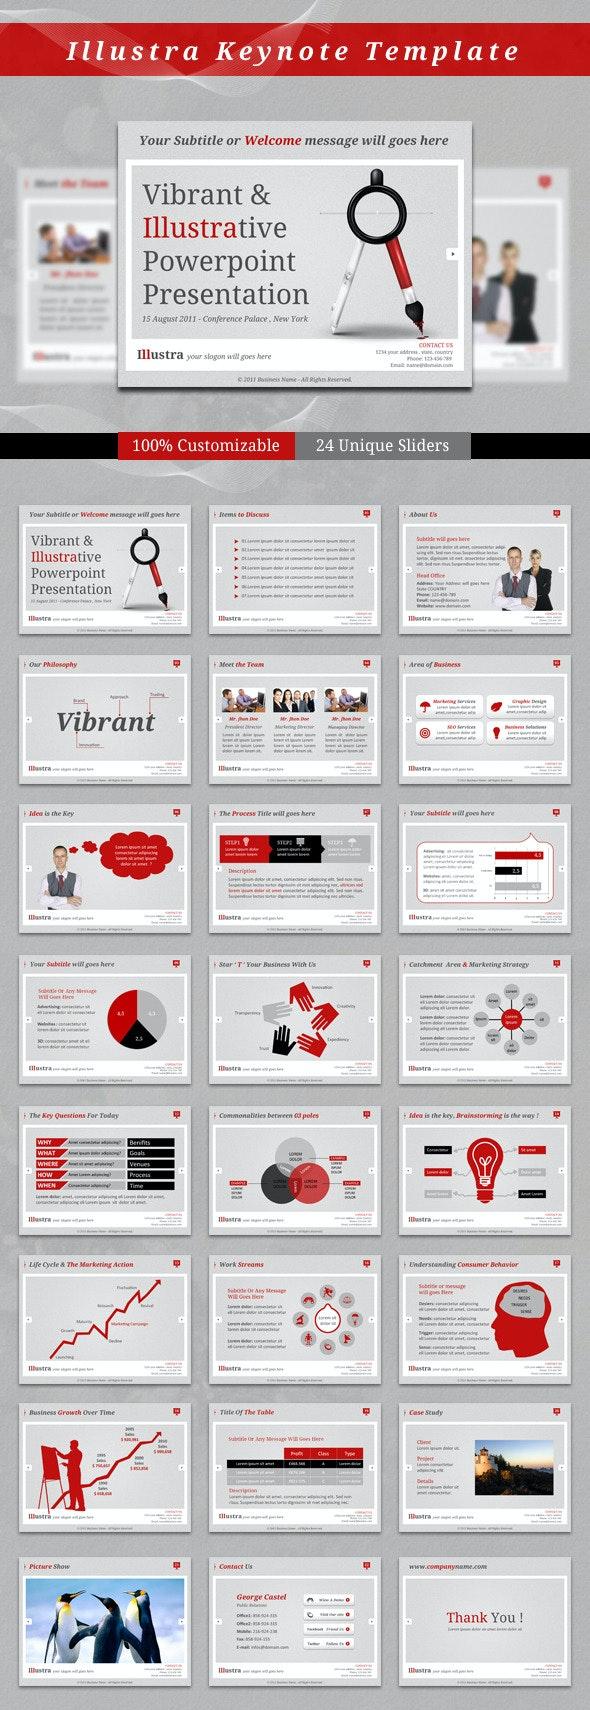 Illustra Keynote Template - Business Keynote Templates